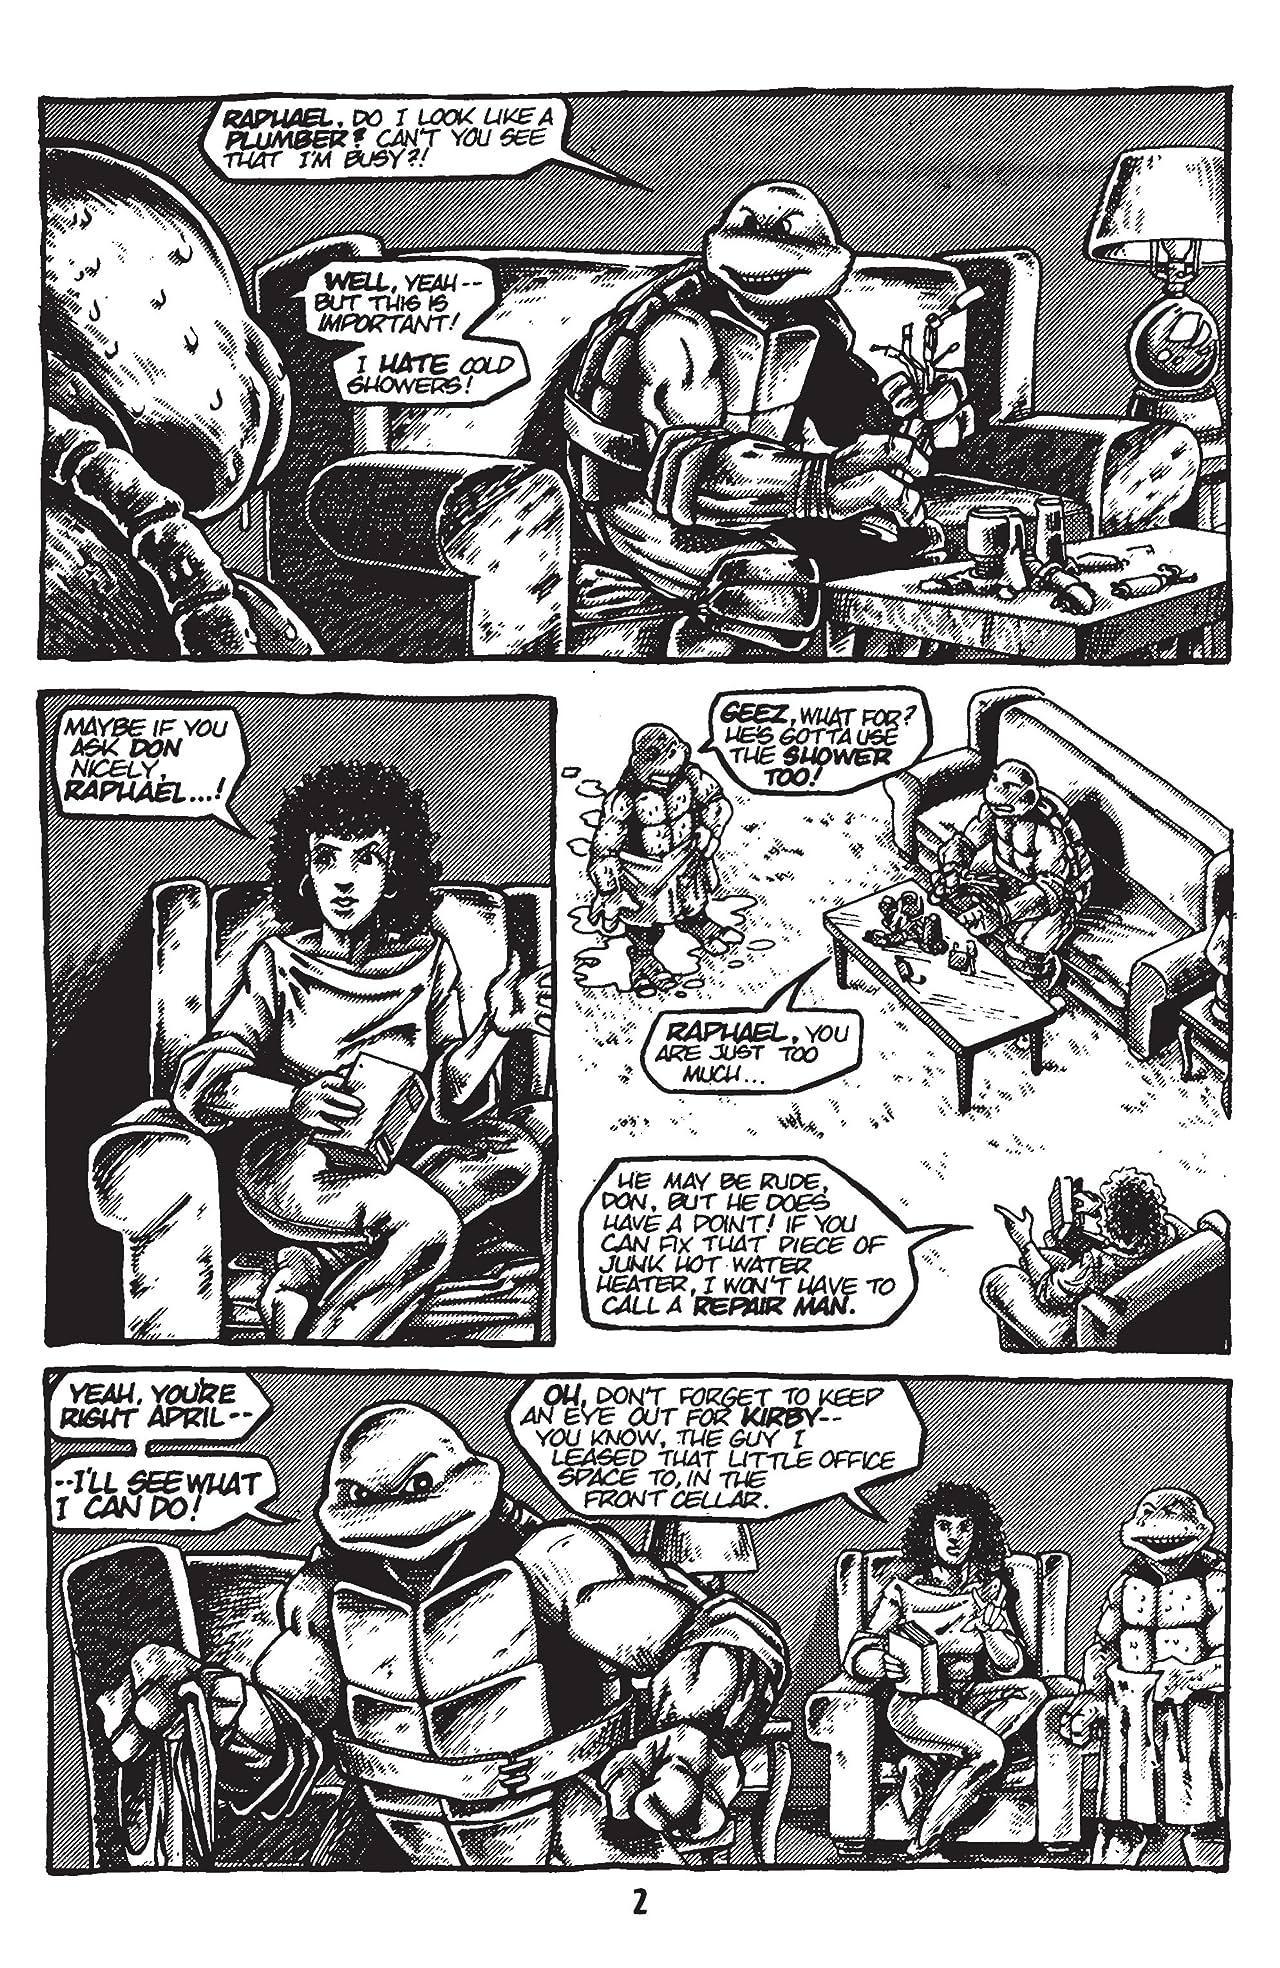 Teenage Mutant Ninja Turtles: Black & White Classics - Donatello